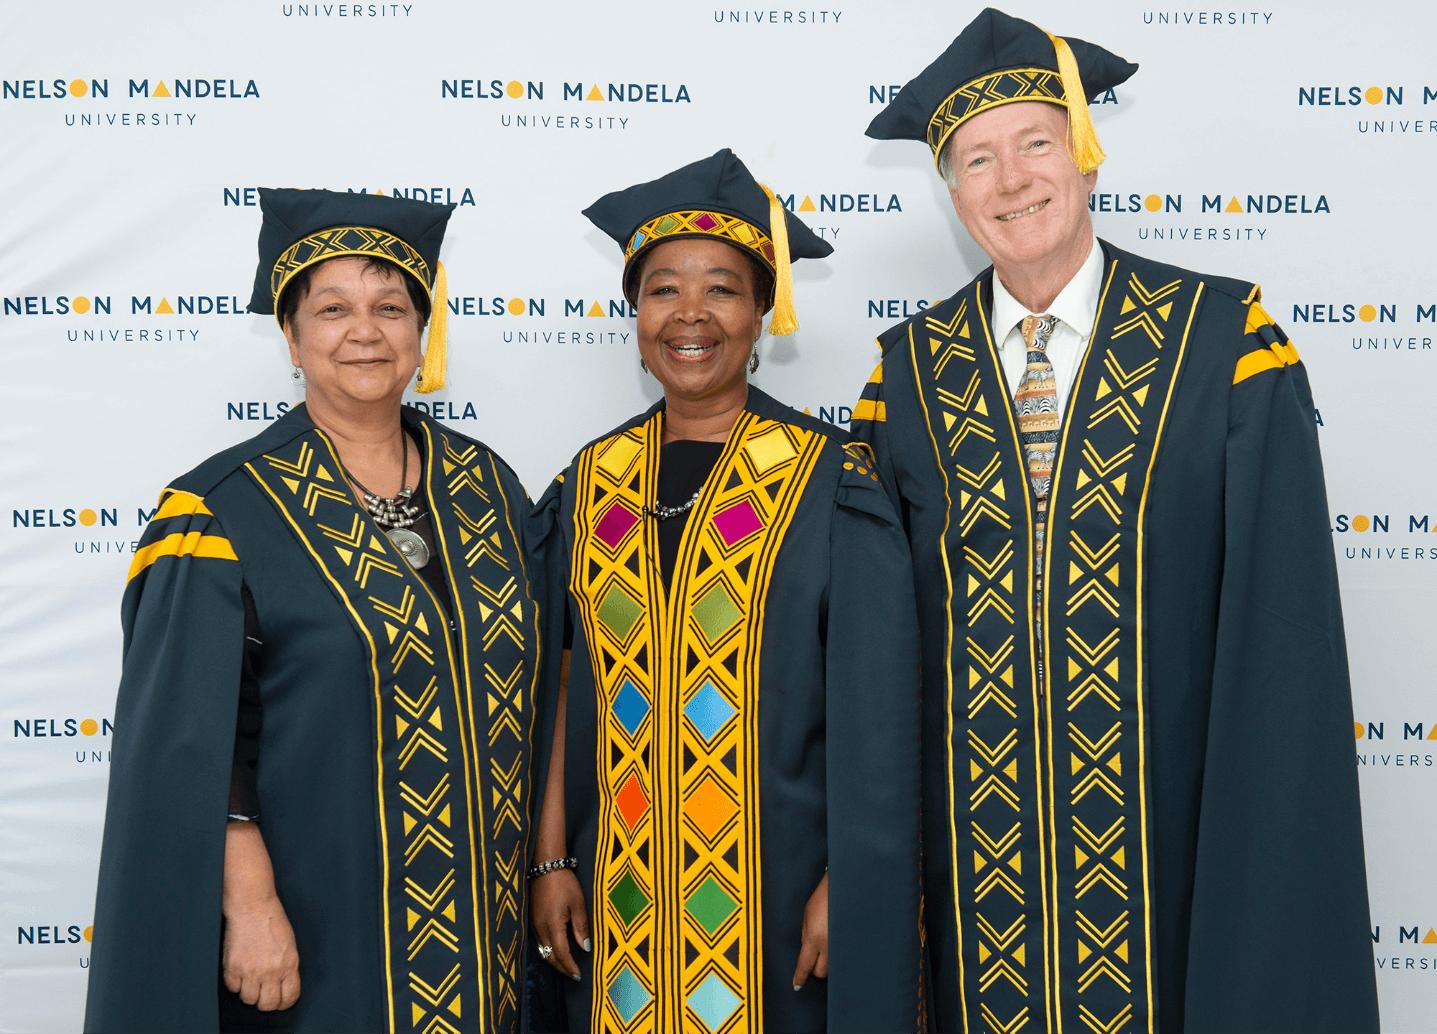 Creative Caterpillar client Nelson Mandela University graduation attire vice cancellor Sibongile Muthwa.